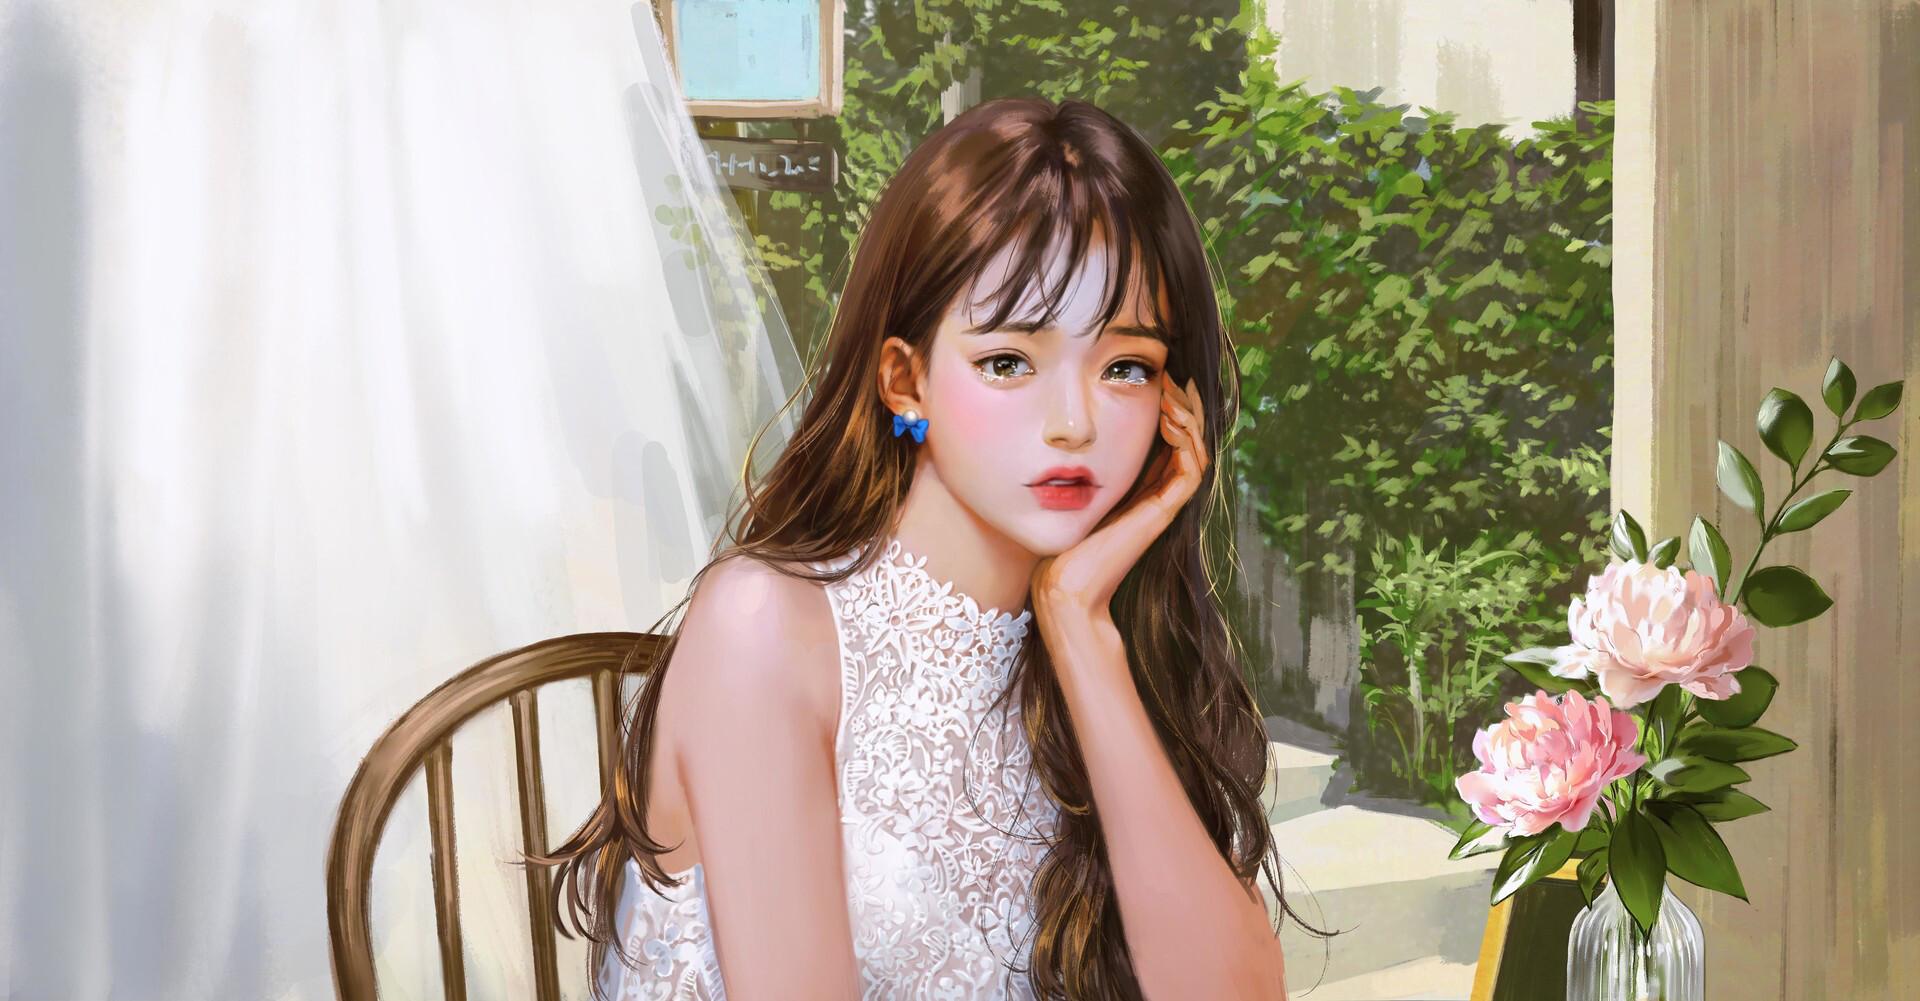 PIXIV 韩国艺术家J.Won Han插图(3)